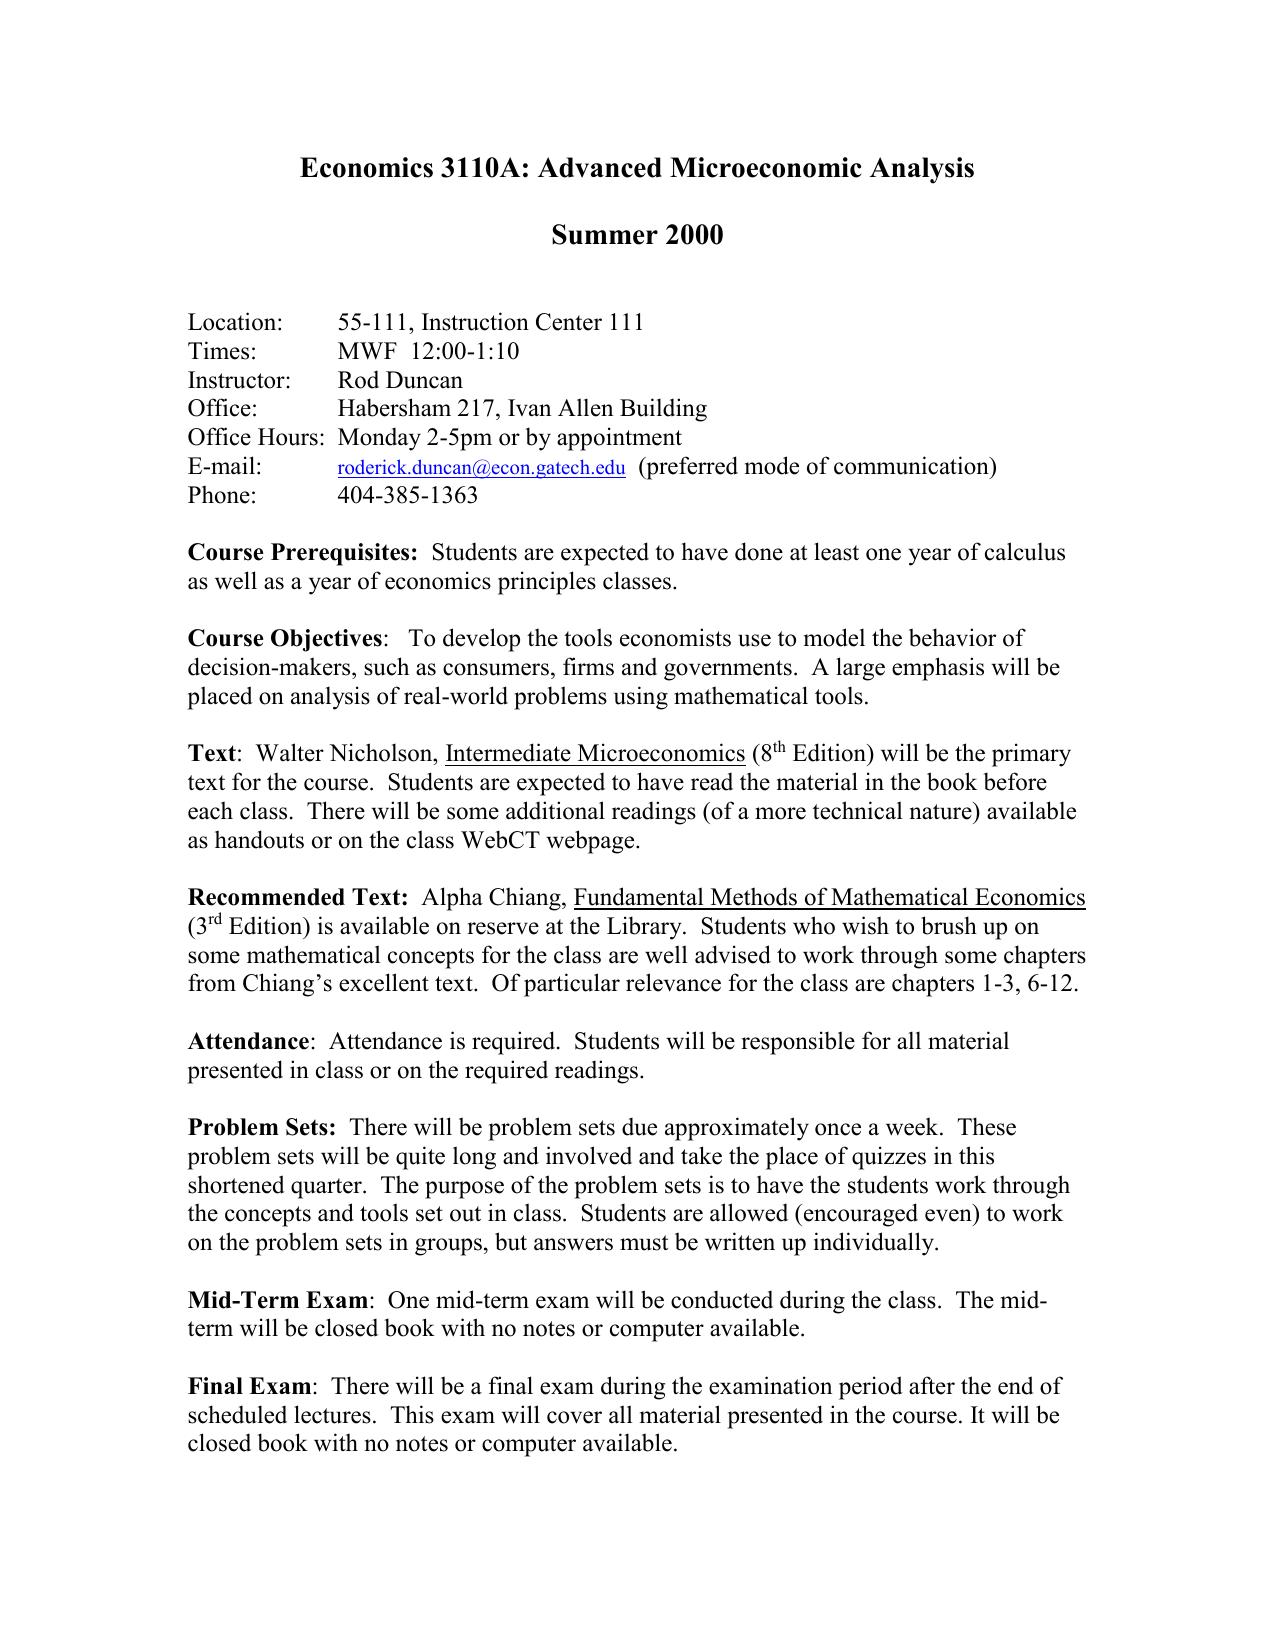 Economics 3110: Advanced Microeconomics